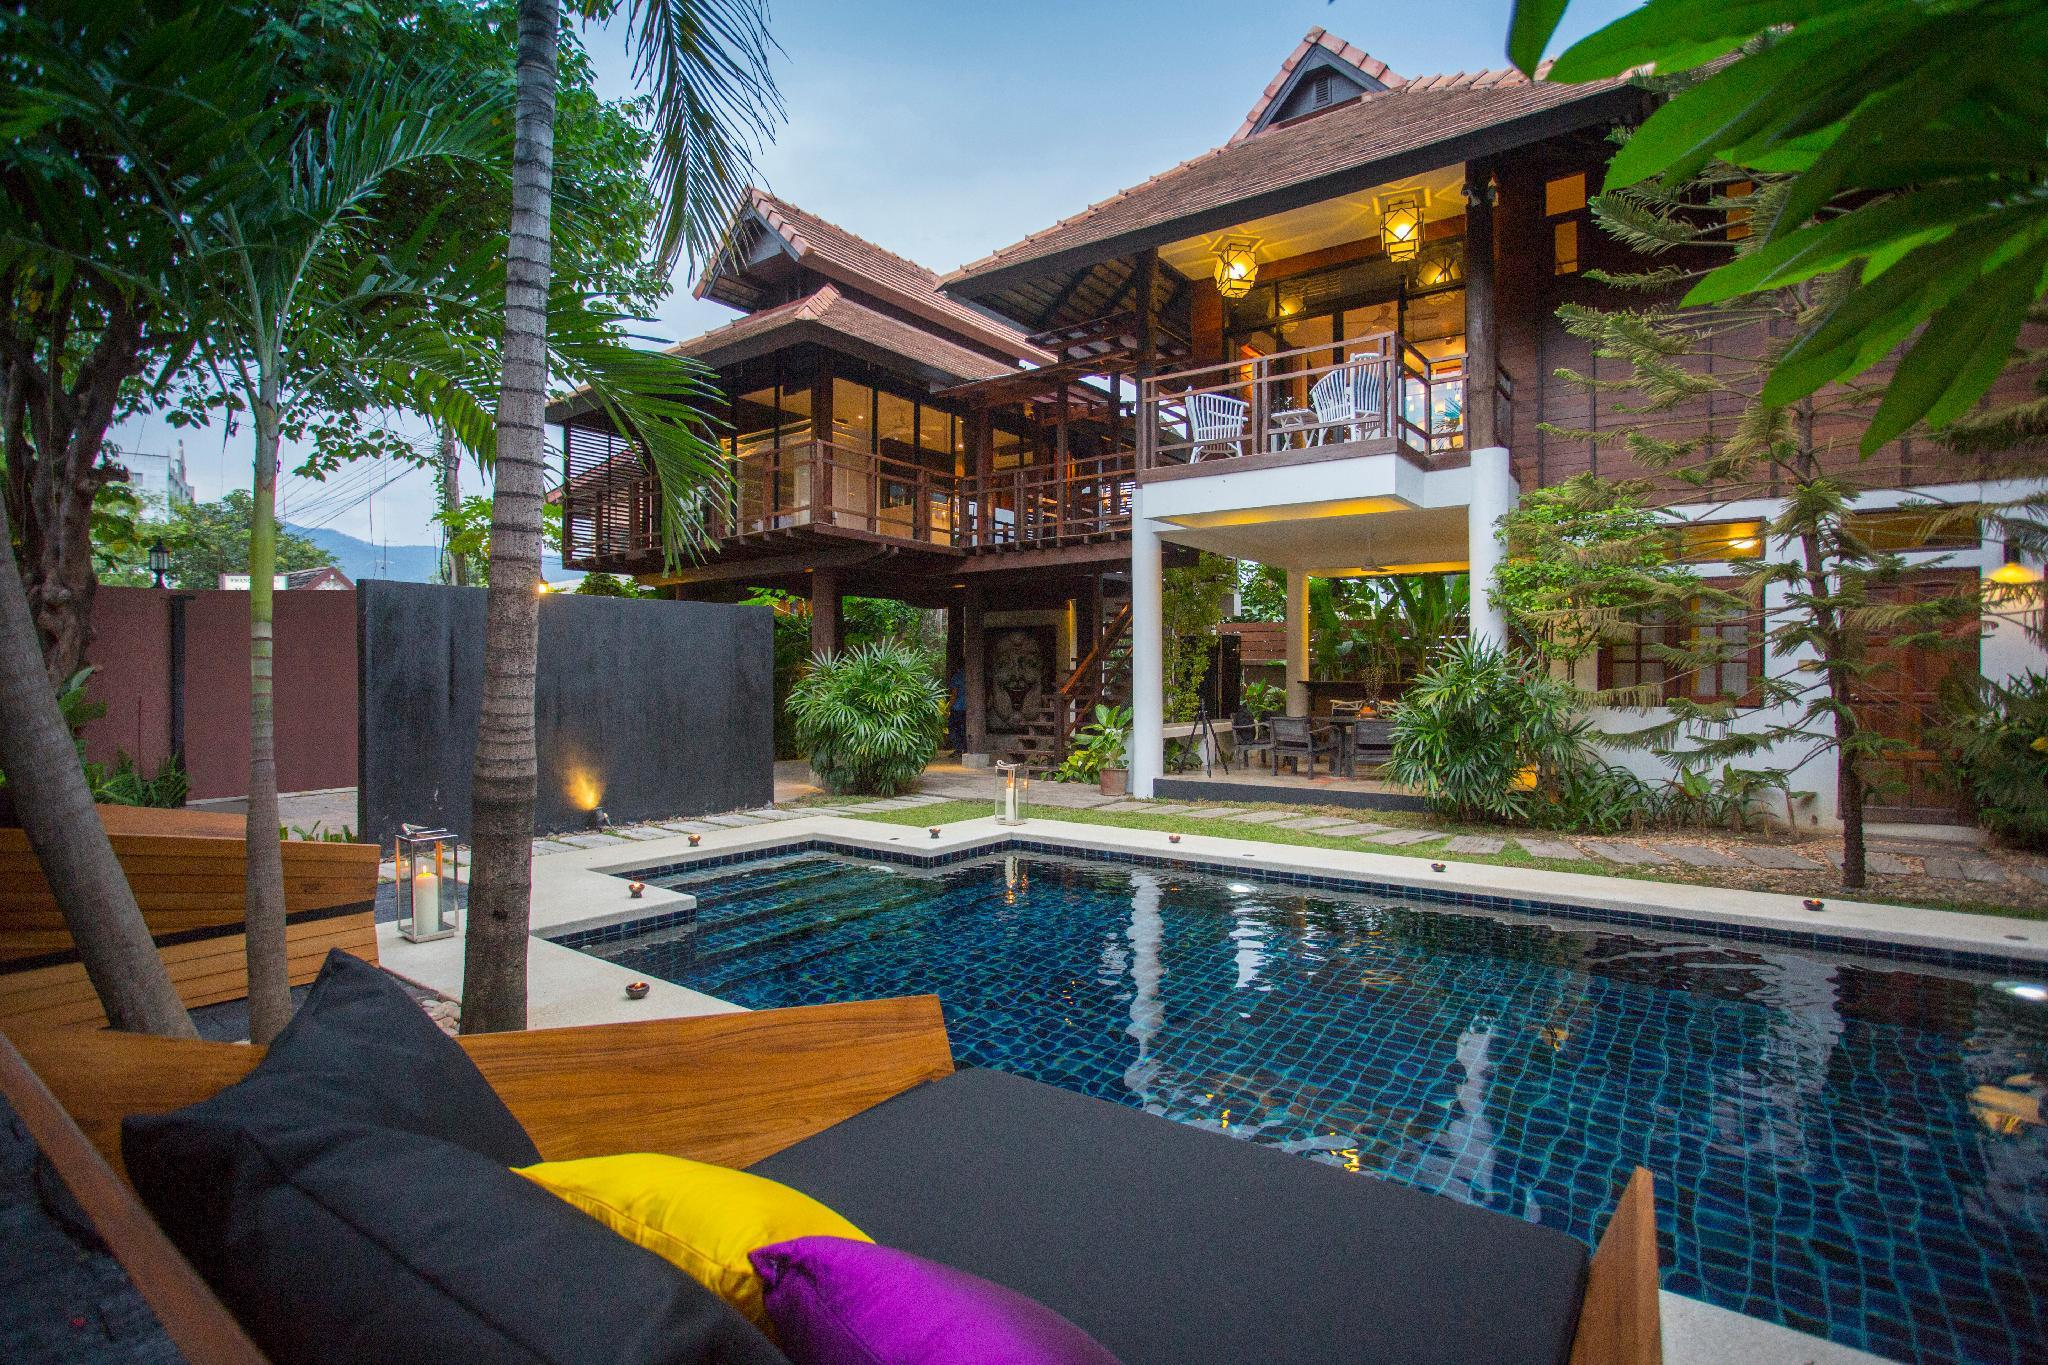 X2 Chiang Mai North Gate Villa ครอสทู เชียงใหม่ นอร์ธ เกท วิลล่า